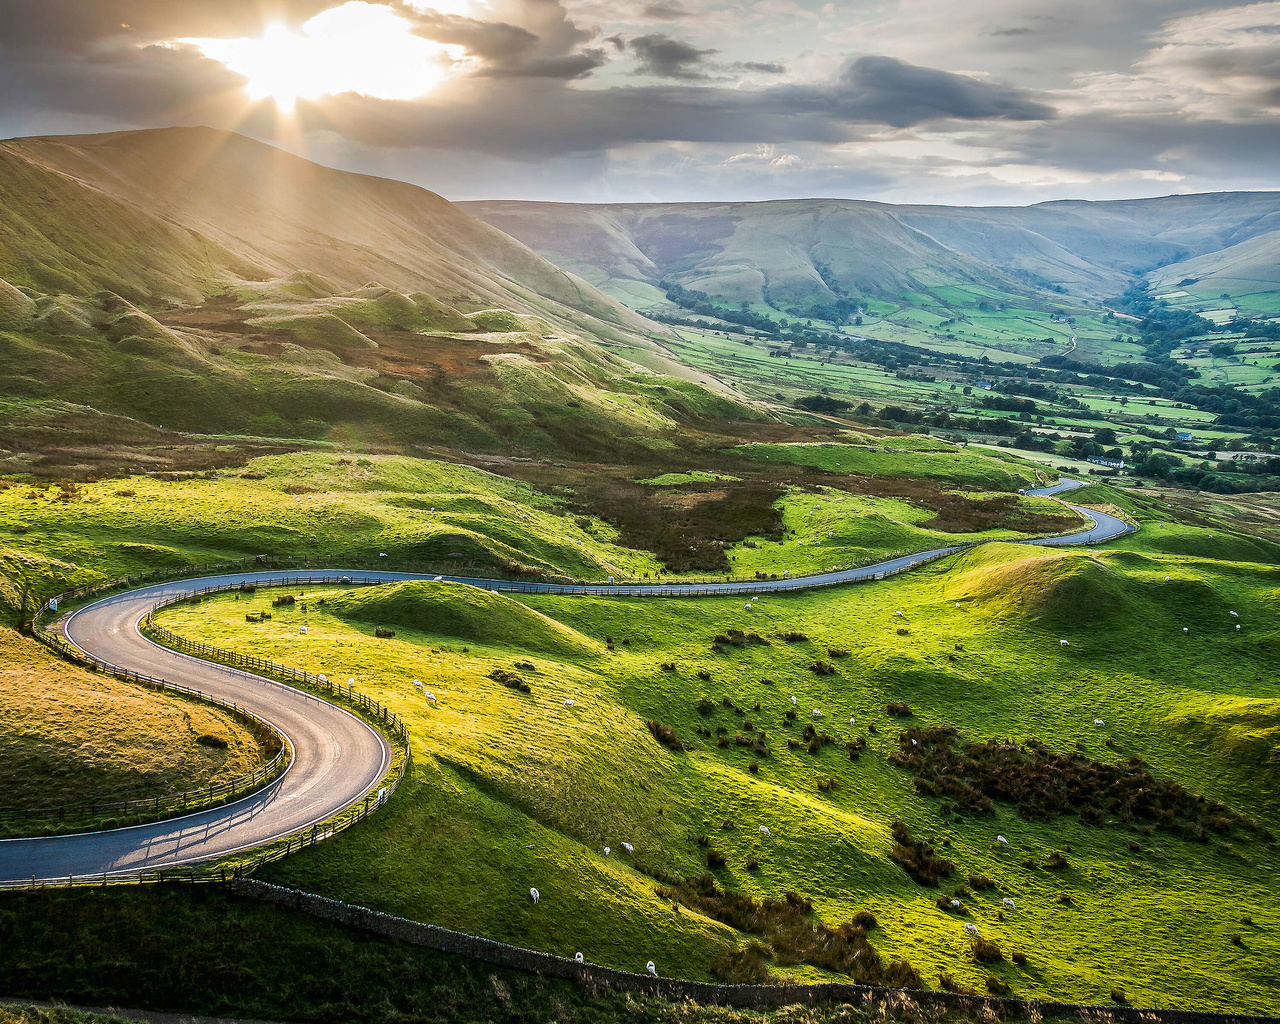 дорога, зелень, трава, солнце, холмы, пастбище